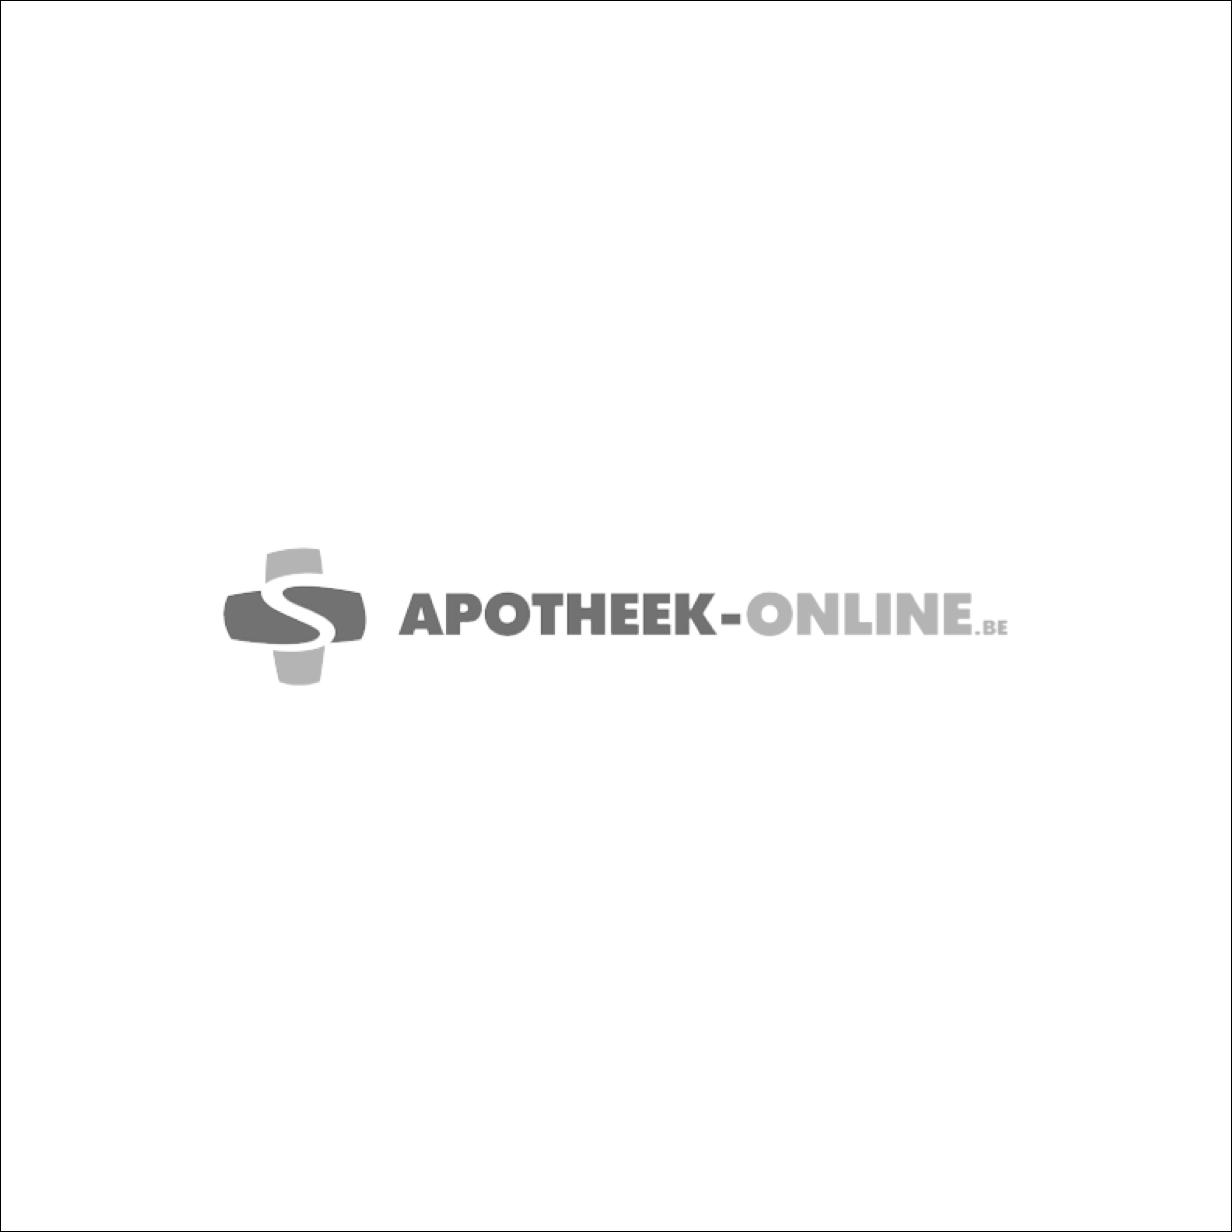 Bota Handpolsband 200 Medium Huidskleur 1 Stuk